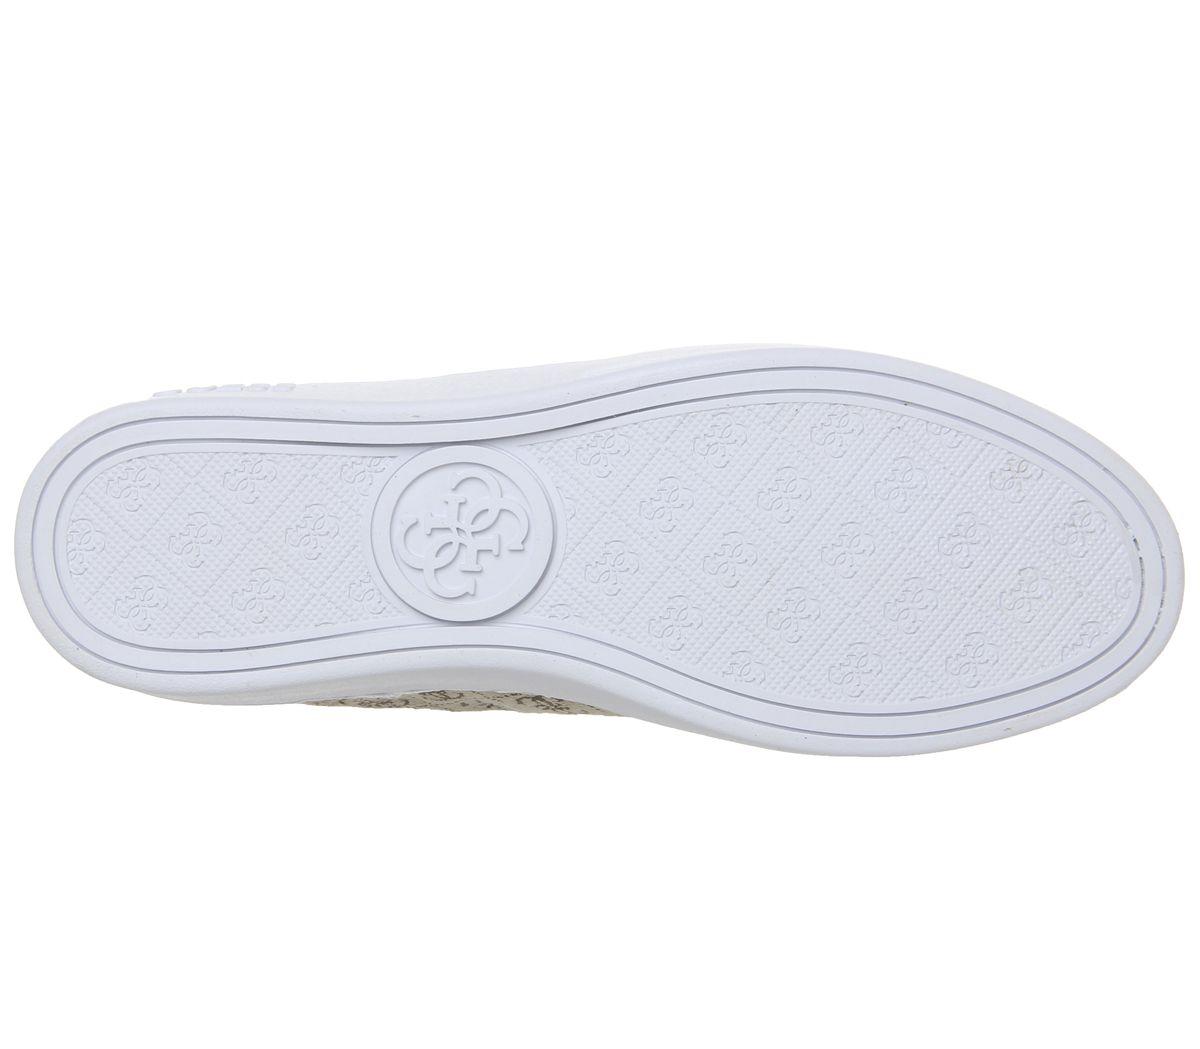 aa4732fc Womens Guess Beckie Sneakers Beige Logo Flats | eBay